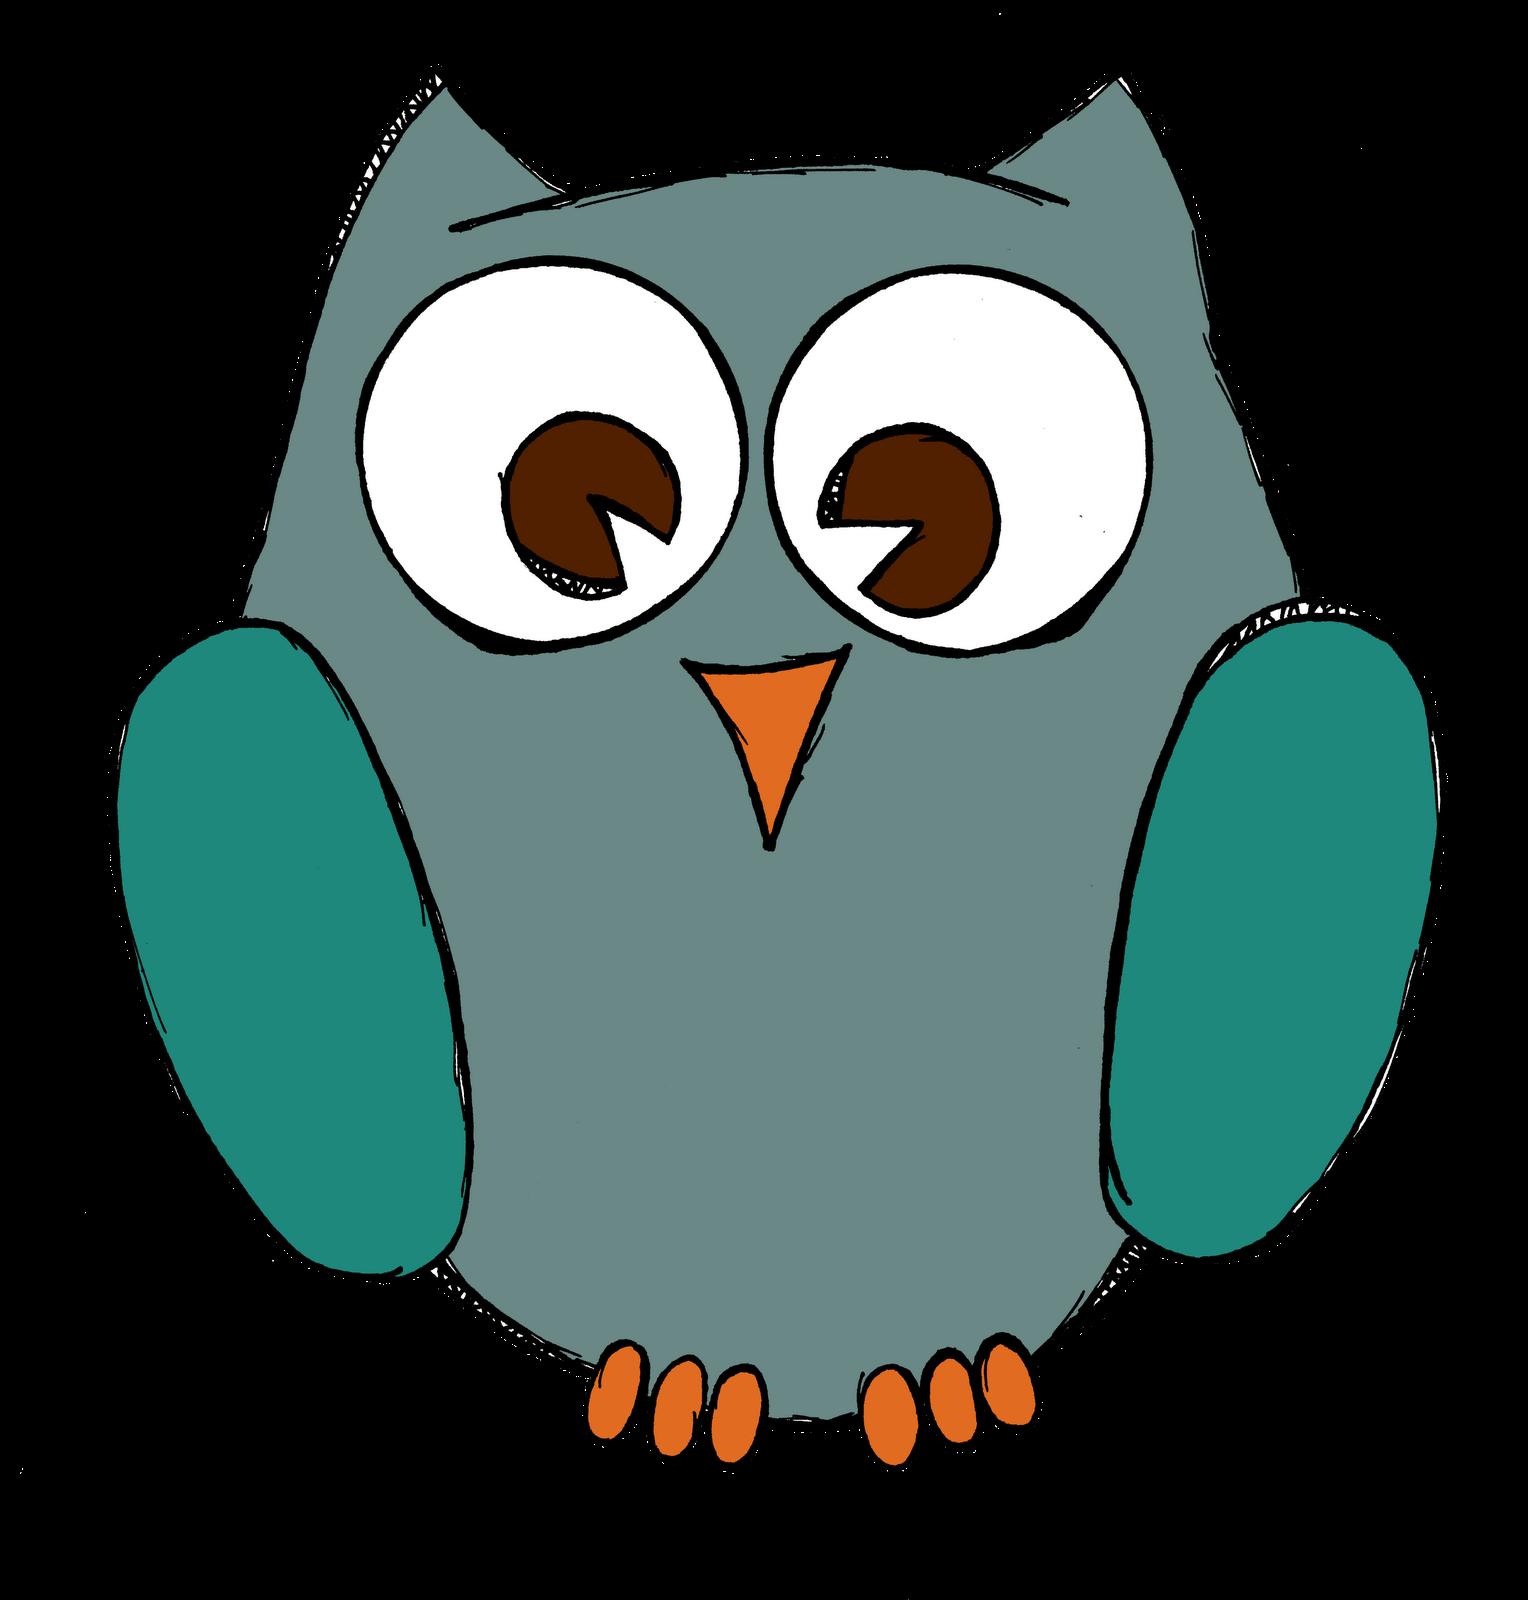 Burrowing at getdrawings com. Heart clipart owl